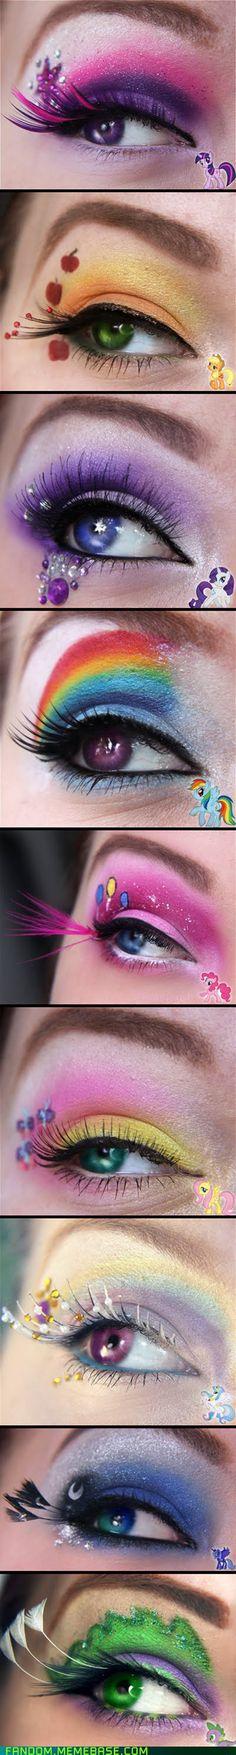 Eyeshadow styles